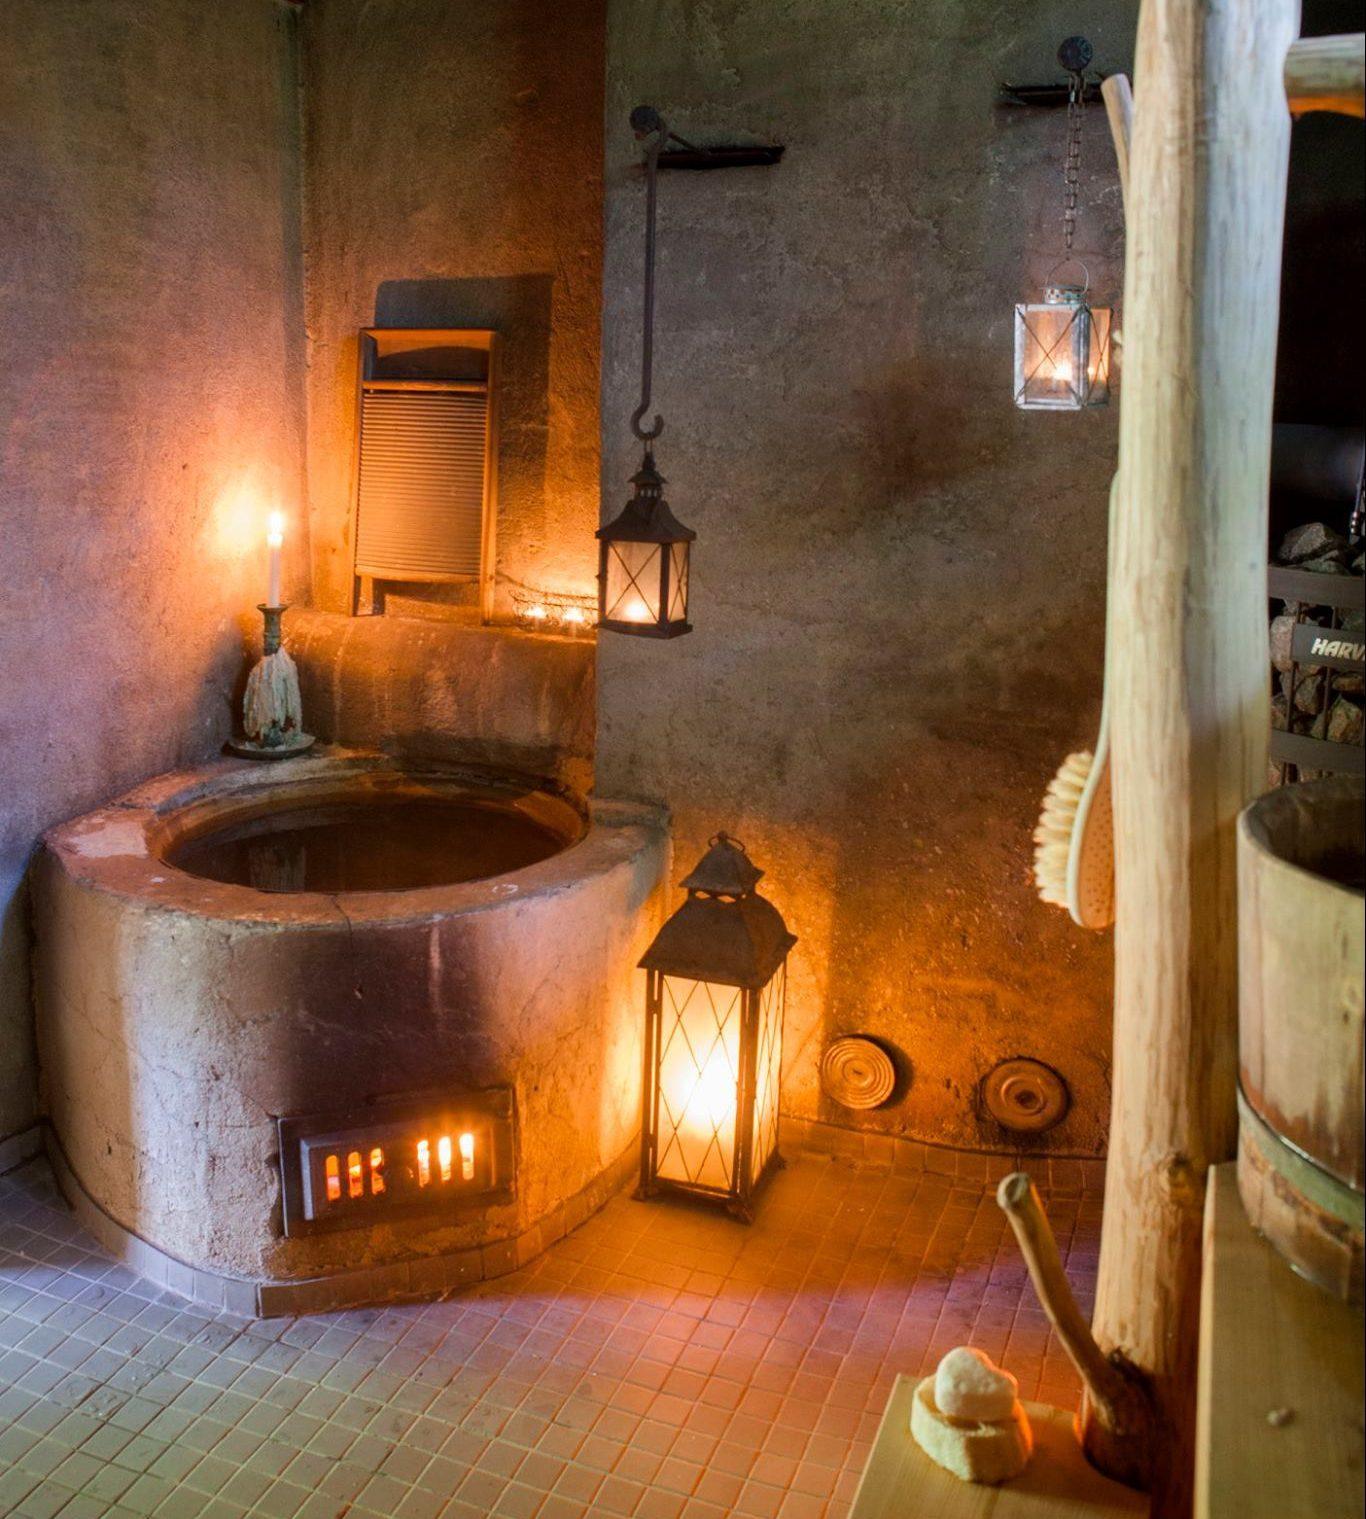 unique spas in finland The Kaurilan Sauna